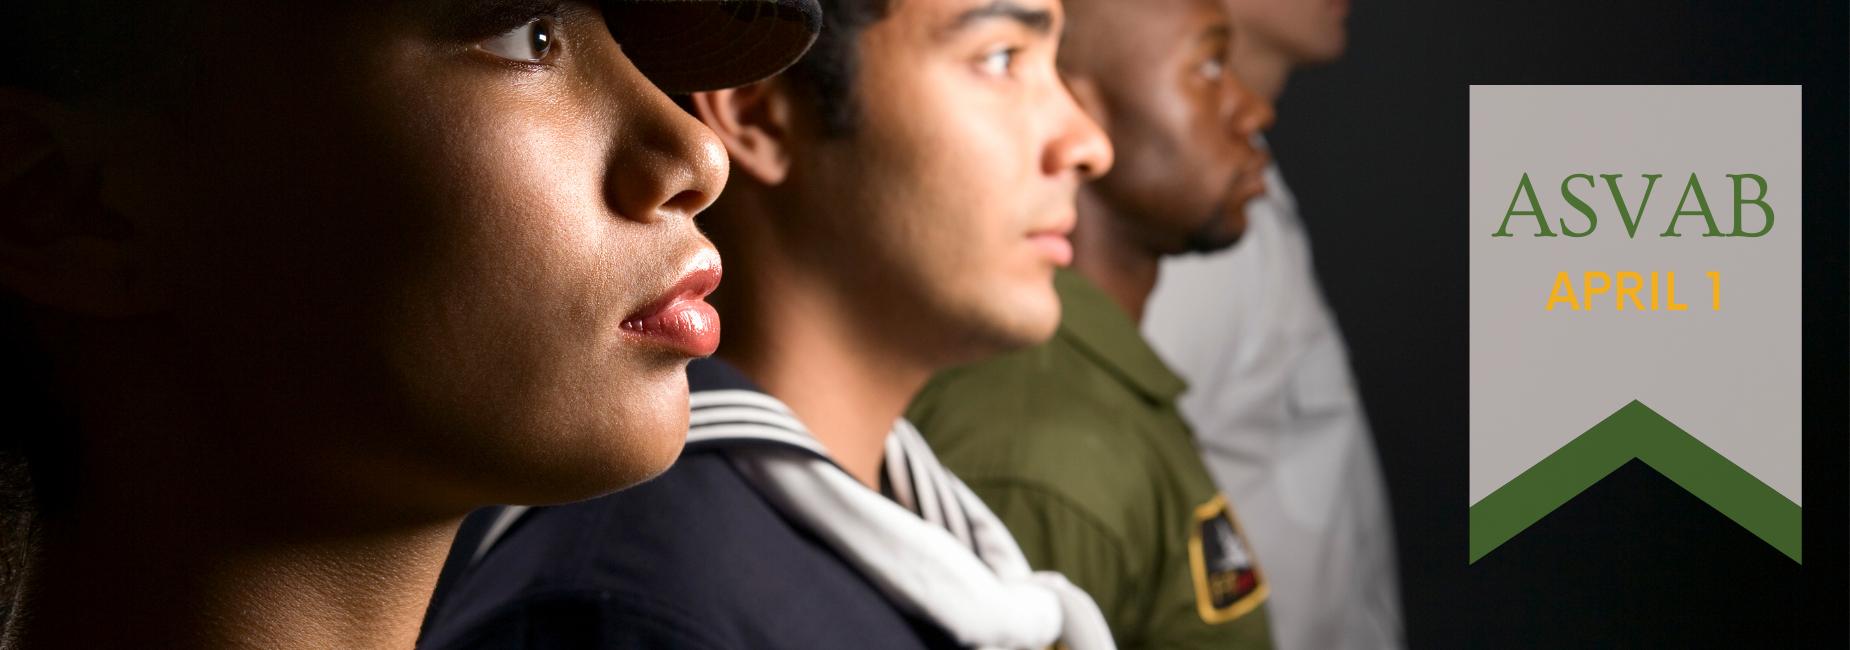 4 military service members in uniform